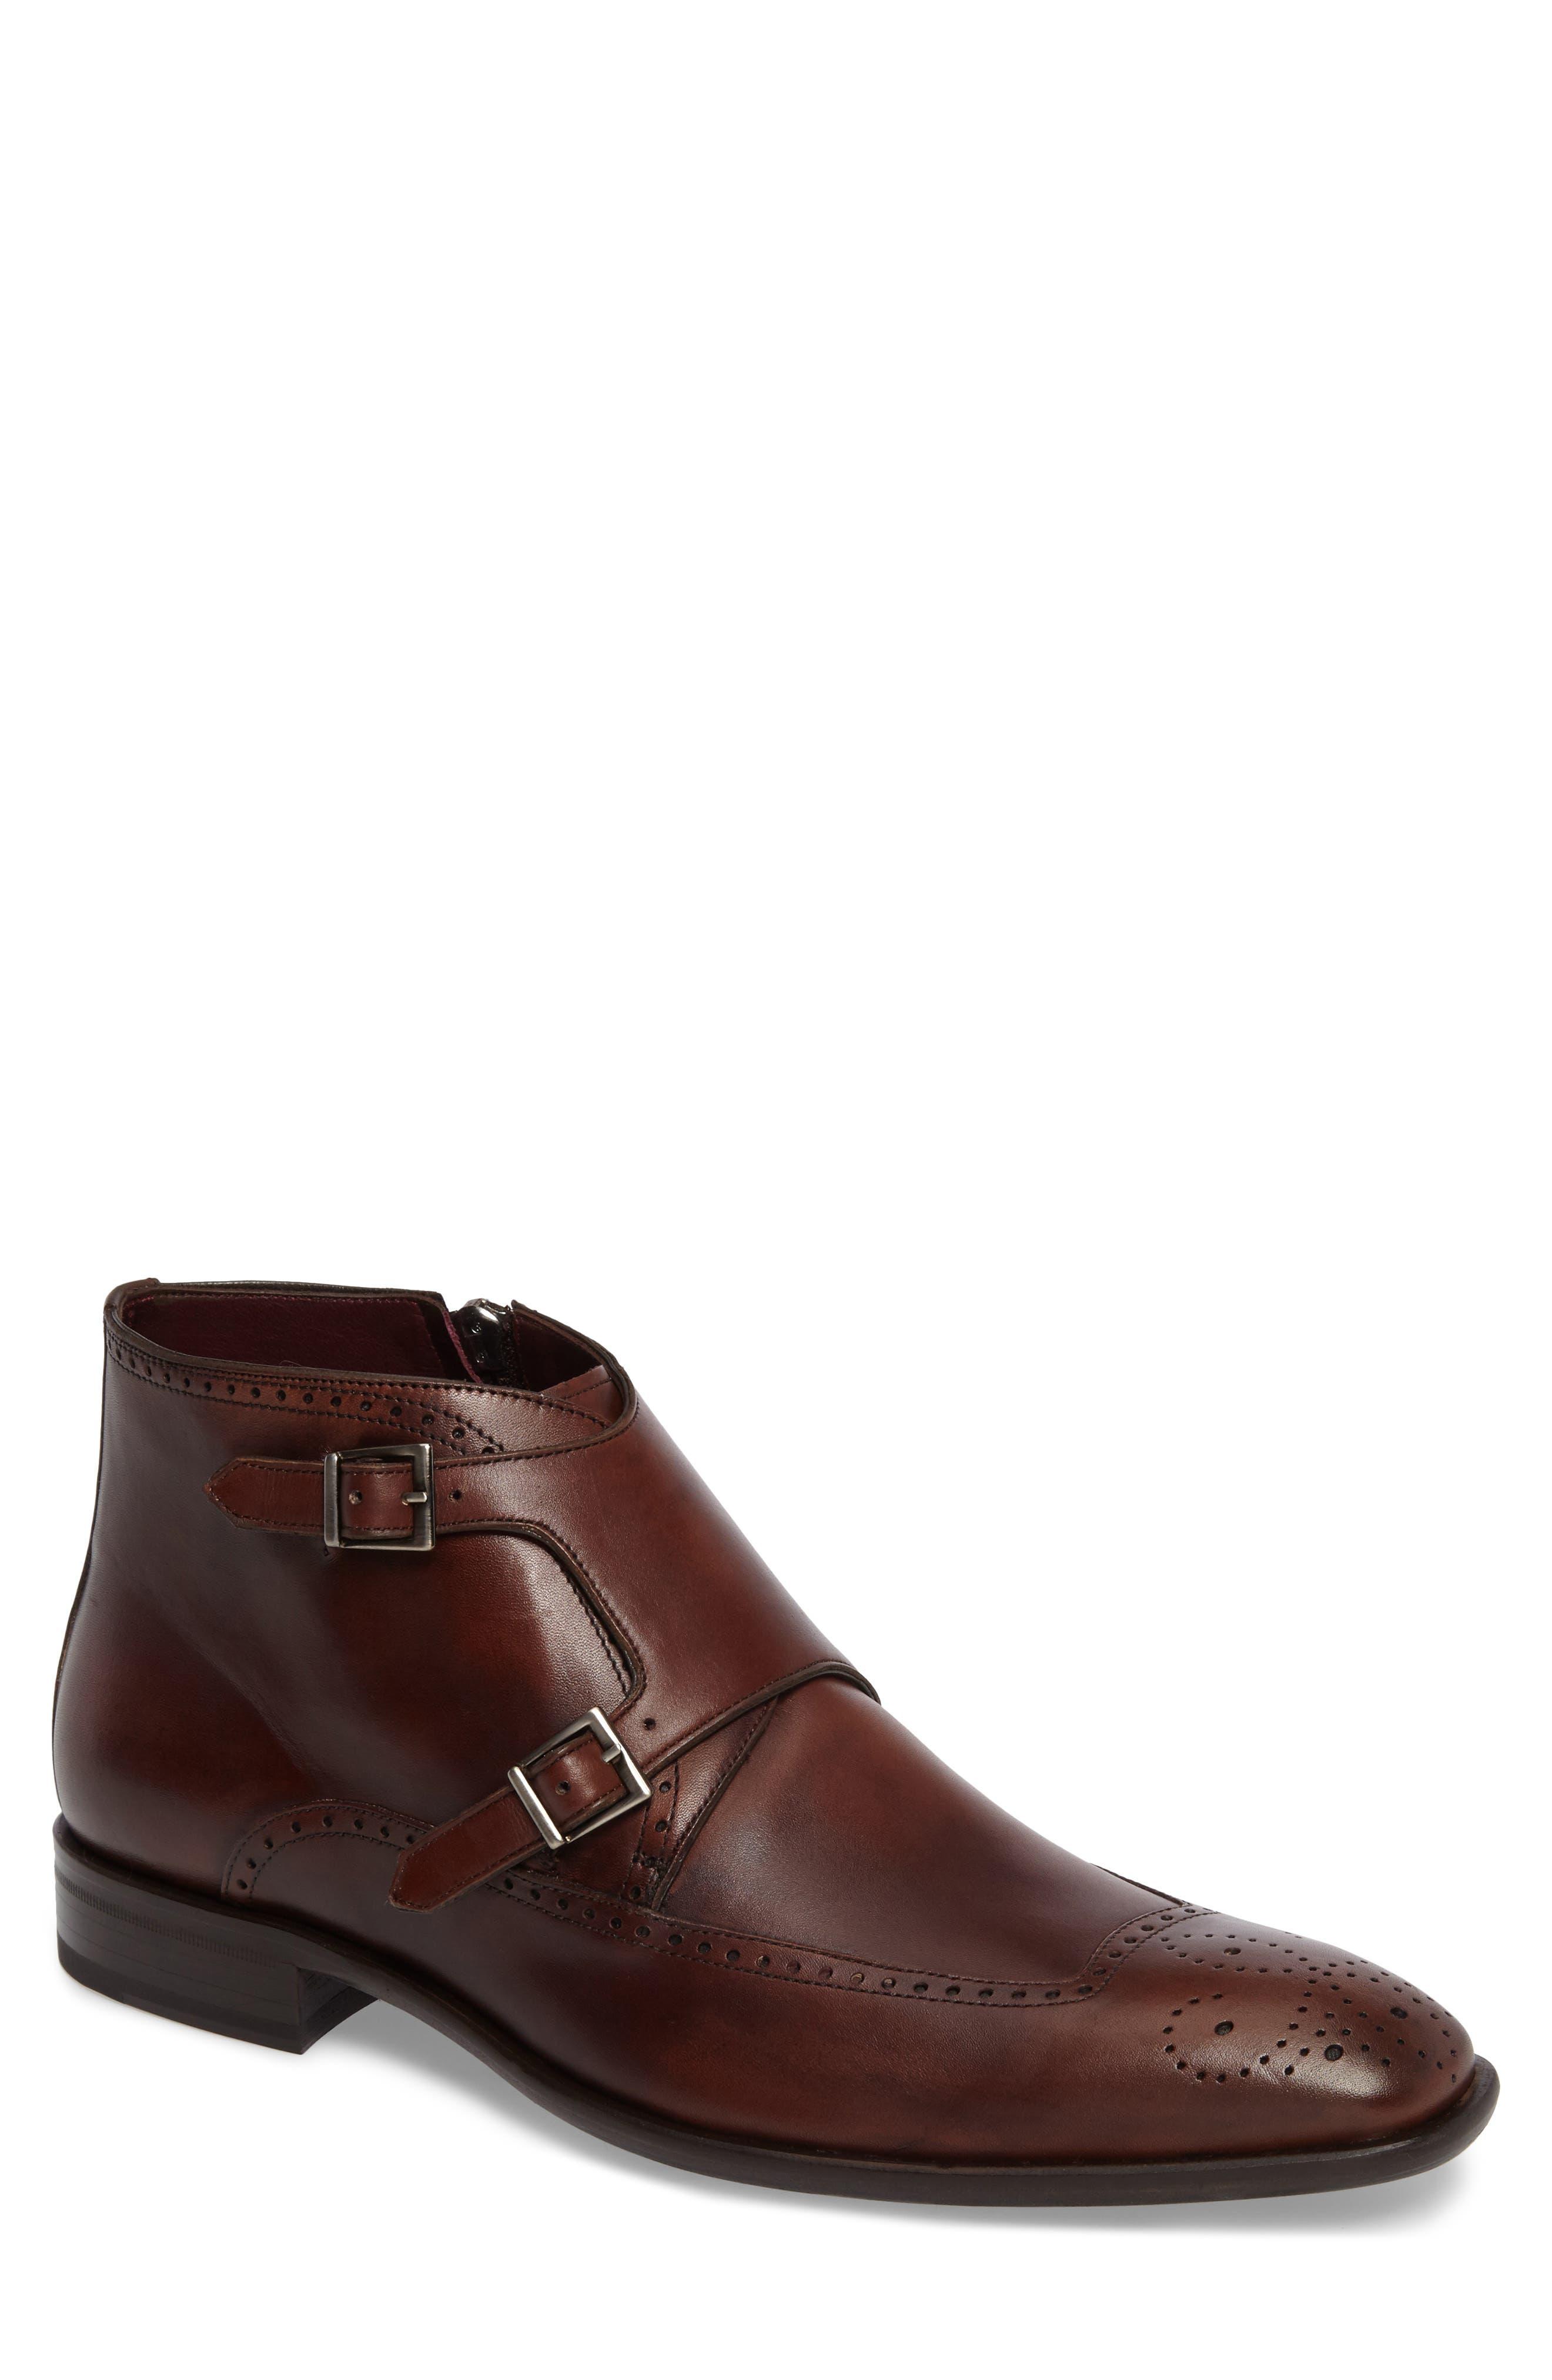 Taberna Double Monk Strap Boot,                             Main thumbnail 1, color,                             Cognac Leather